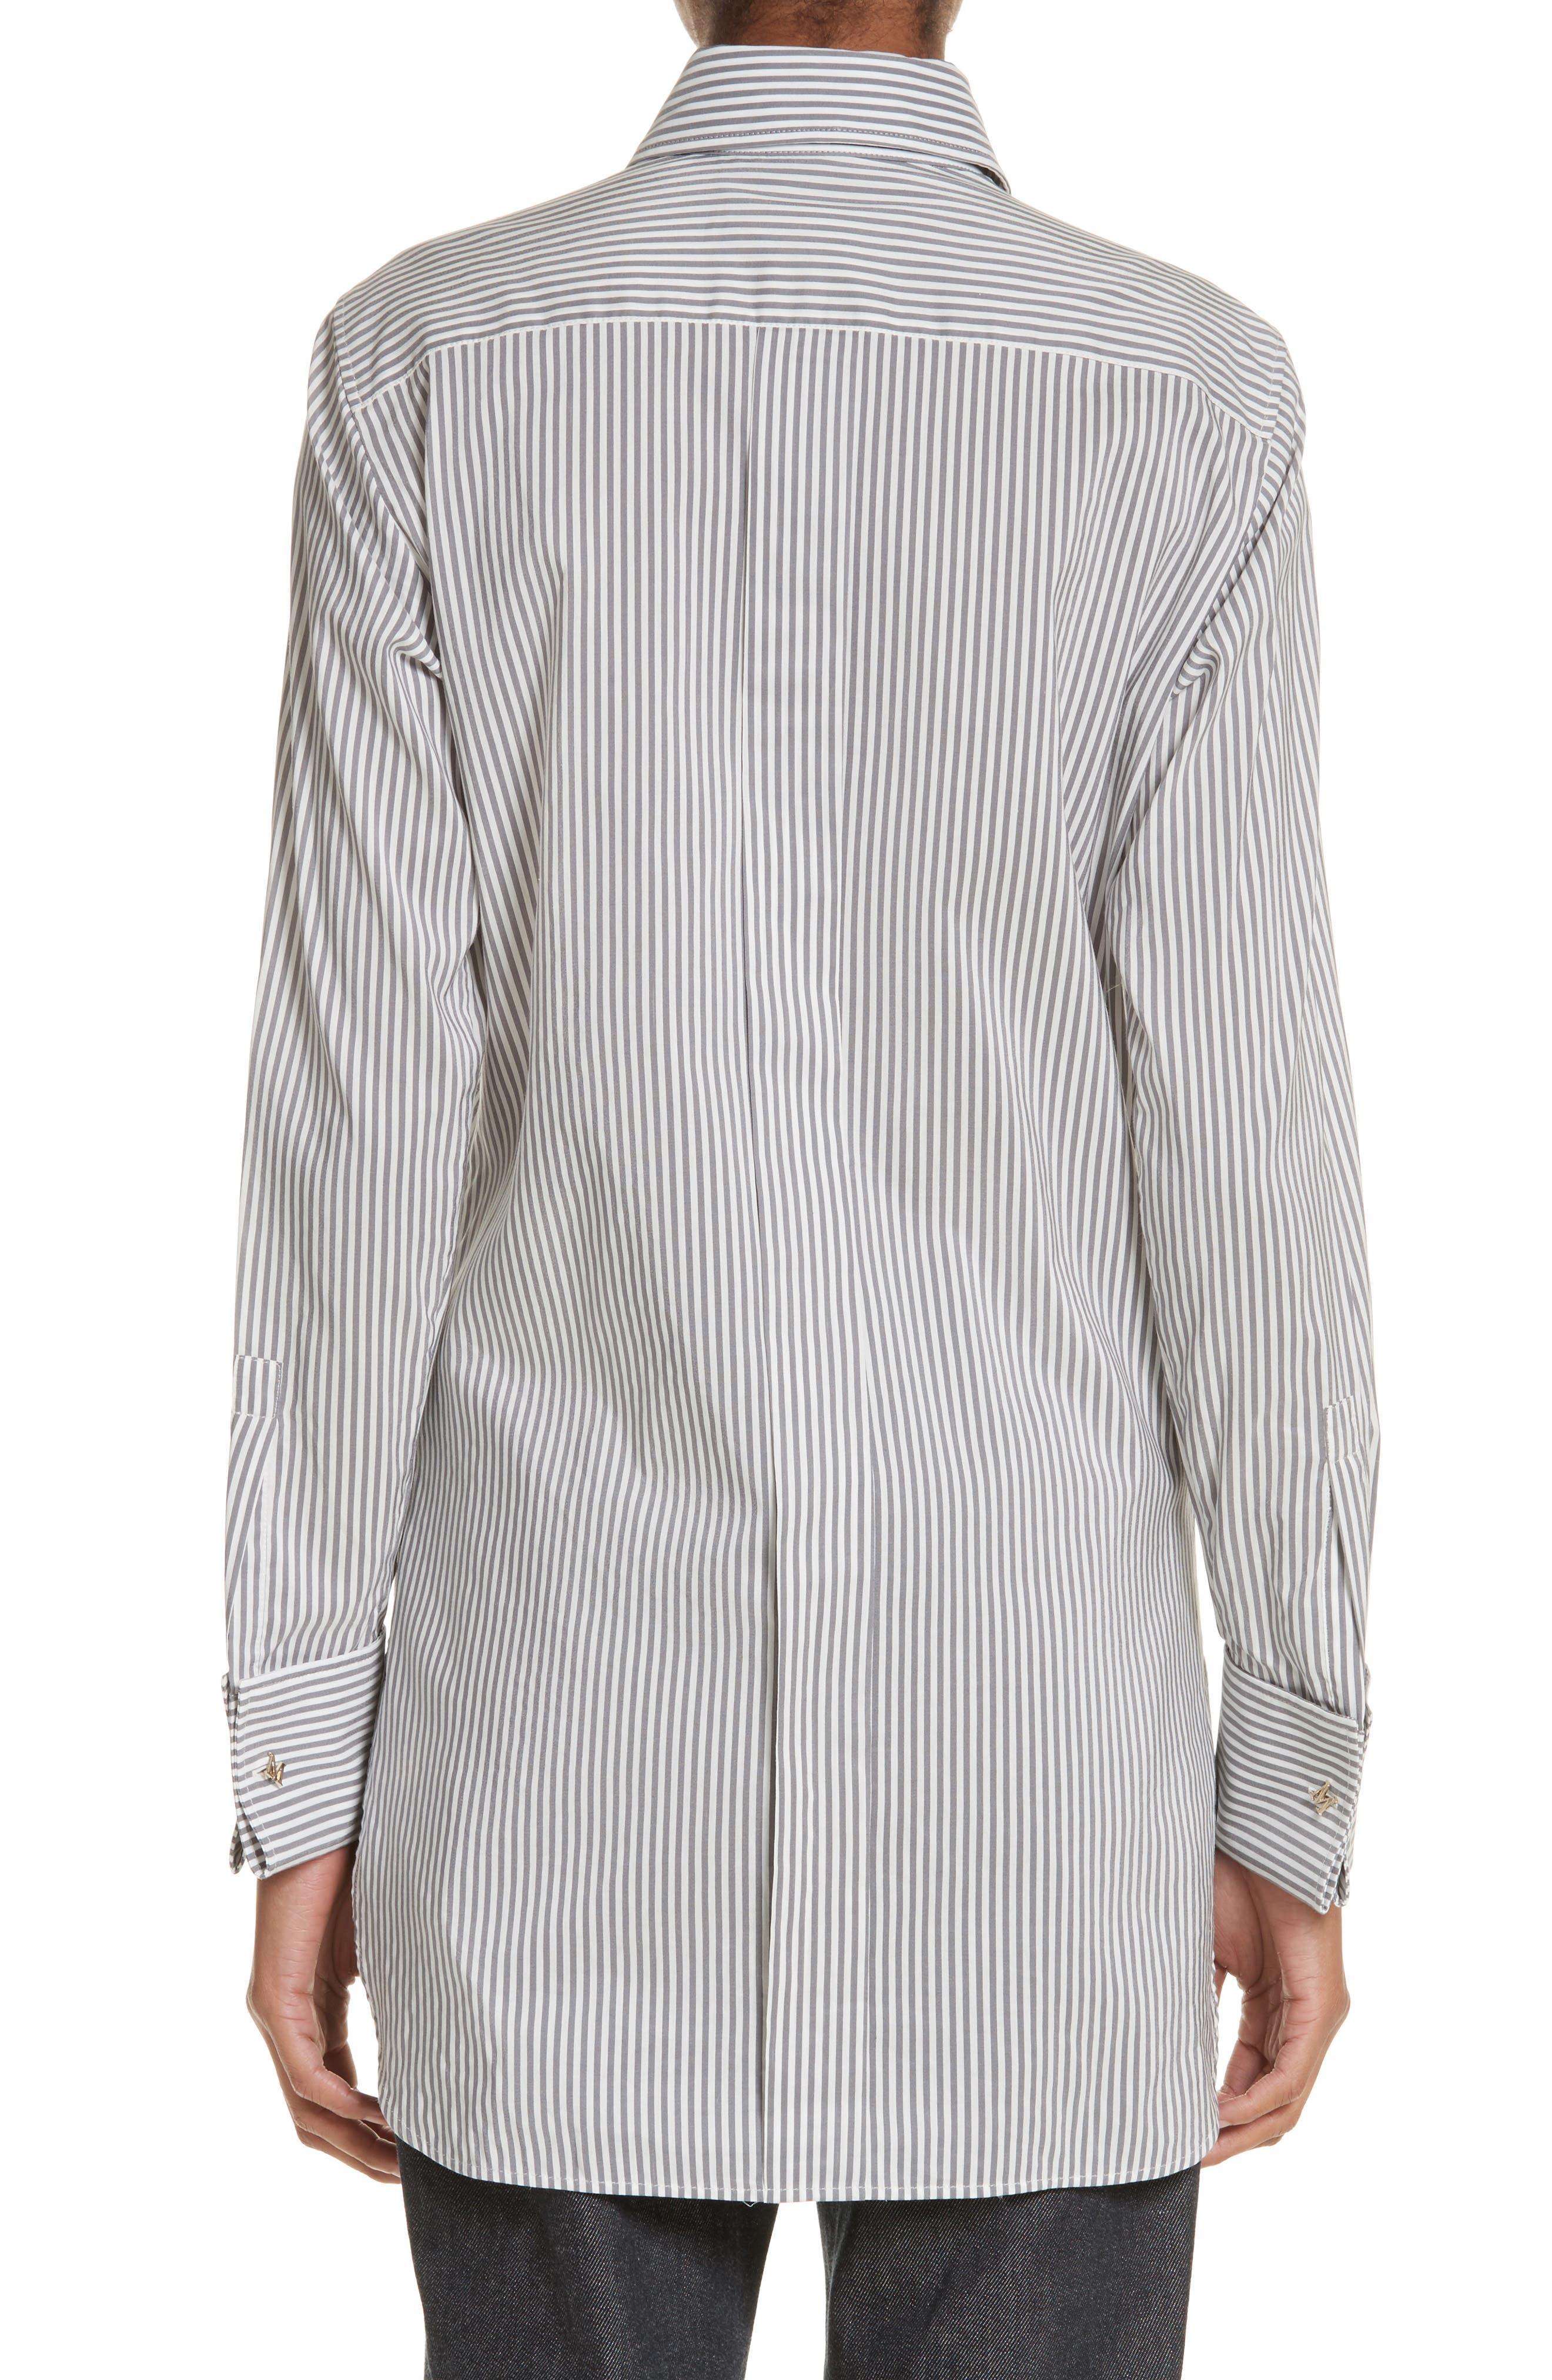 Filato Stripe Cotton & Silk Shirt,                             Alternate thumbnail 2, color,                             034